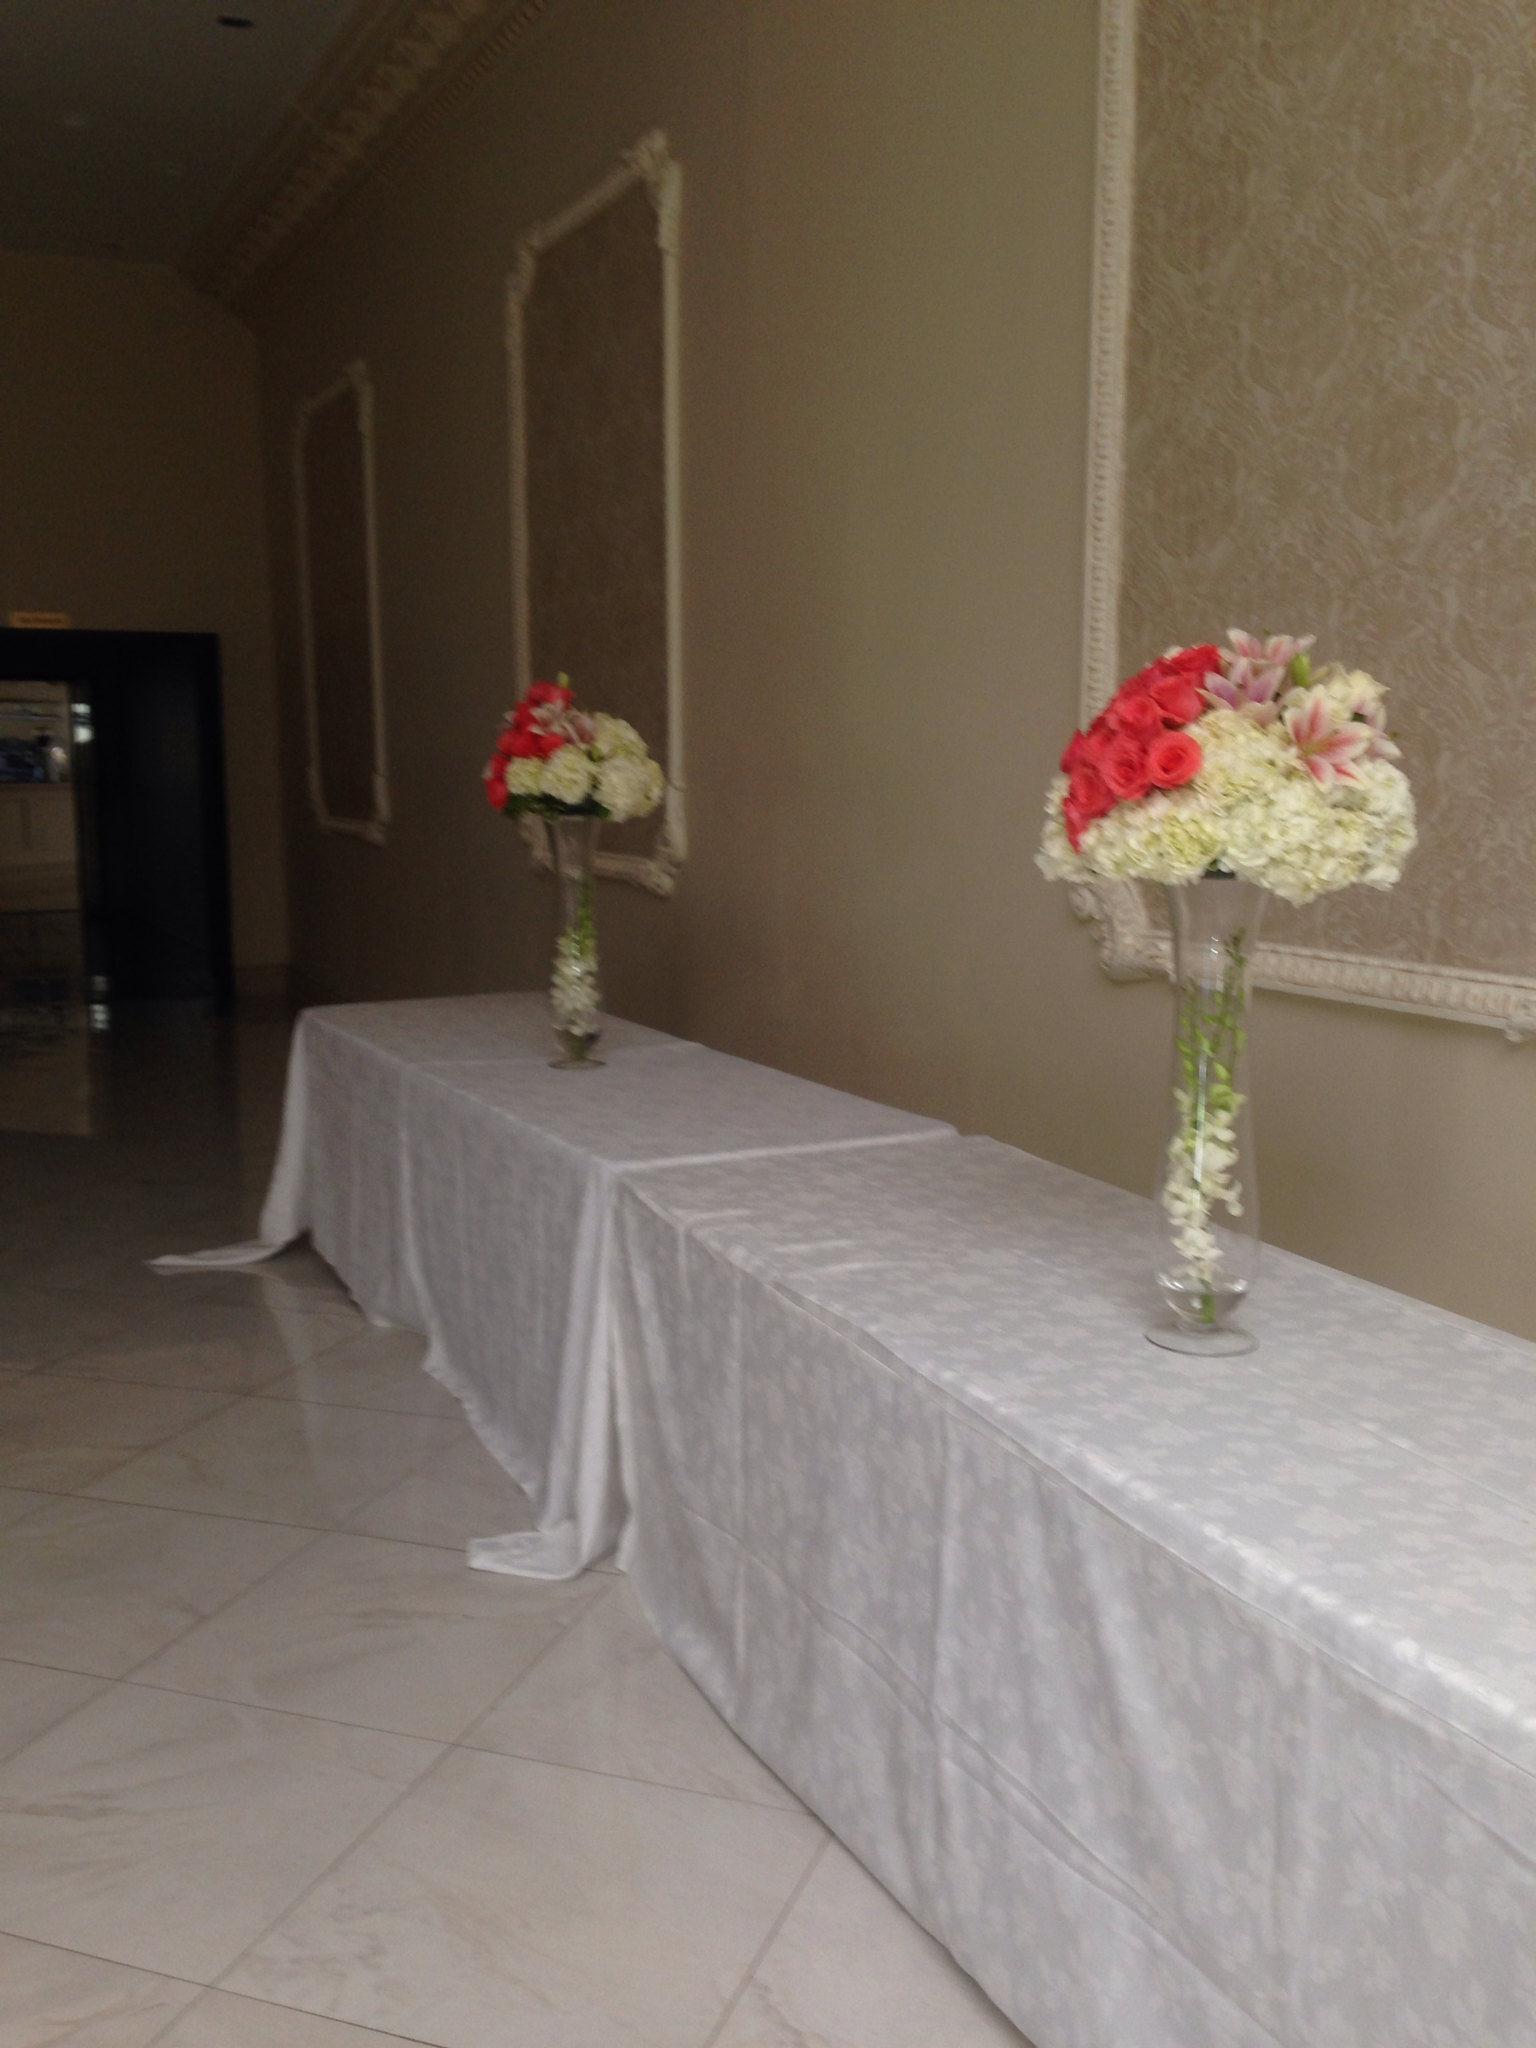 Farah florist. CP21.  $75-90